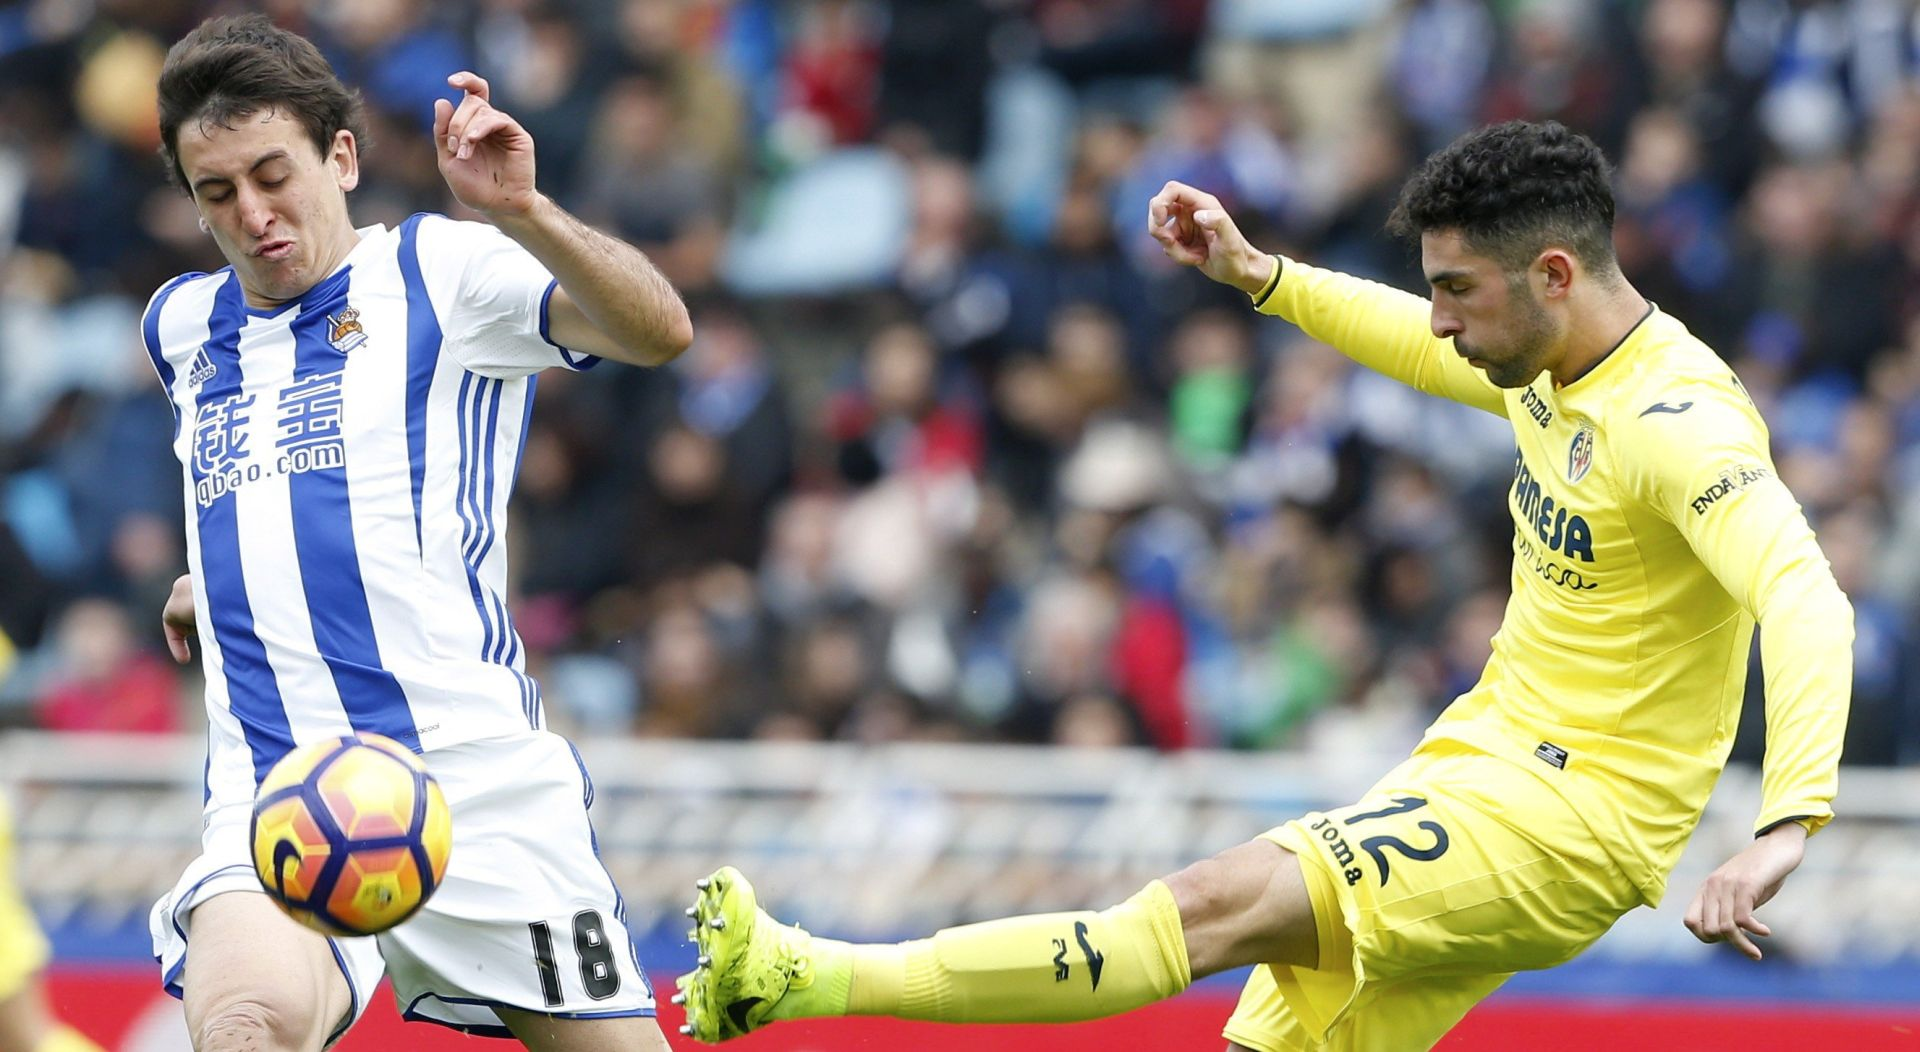 PRIMERA Villarreal do tri boda u četvrtoj minuti nadoknade